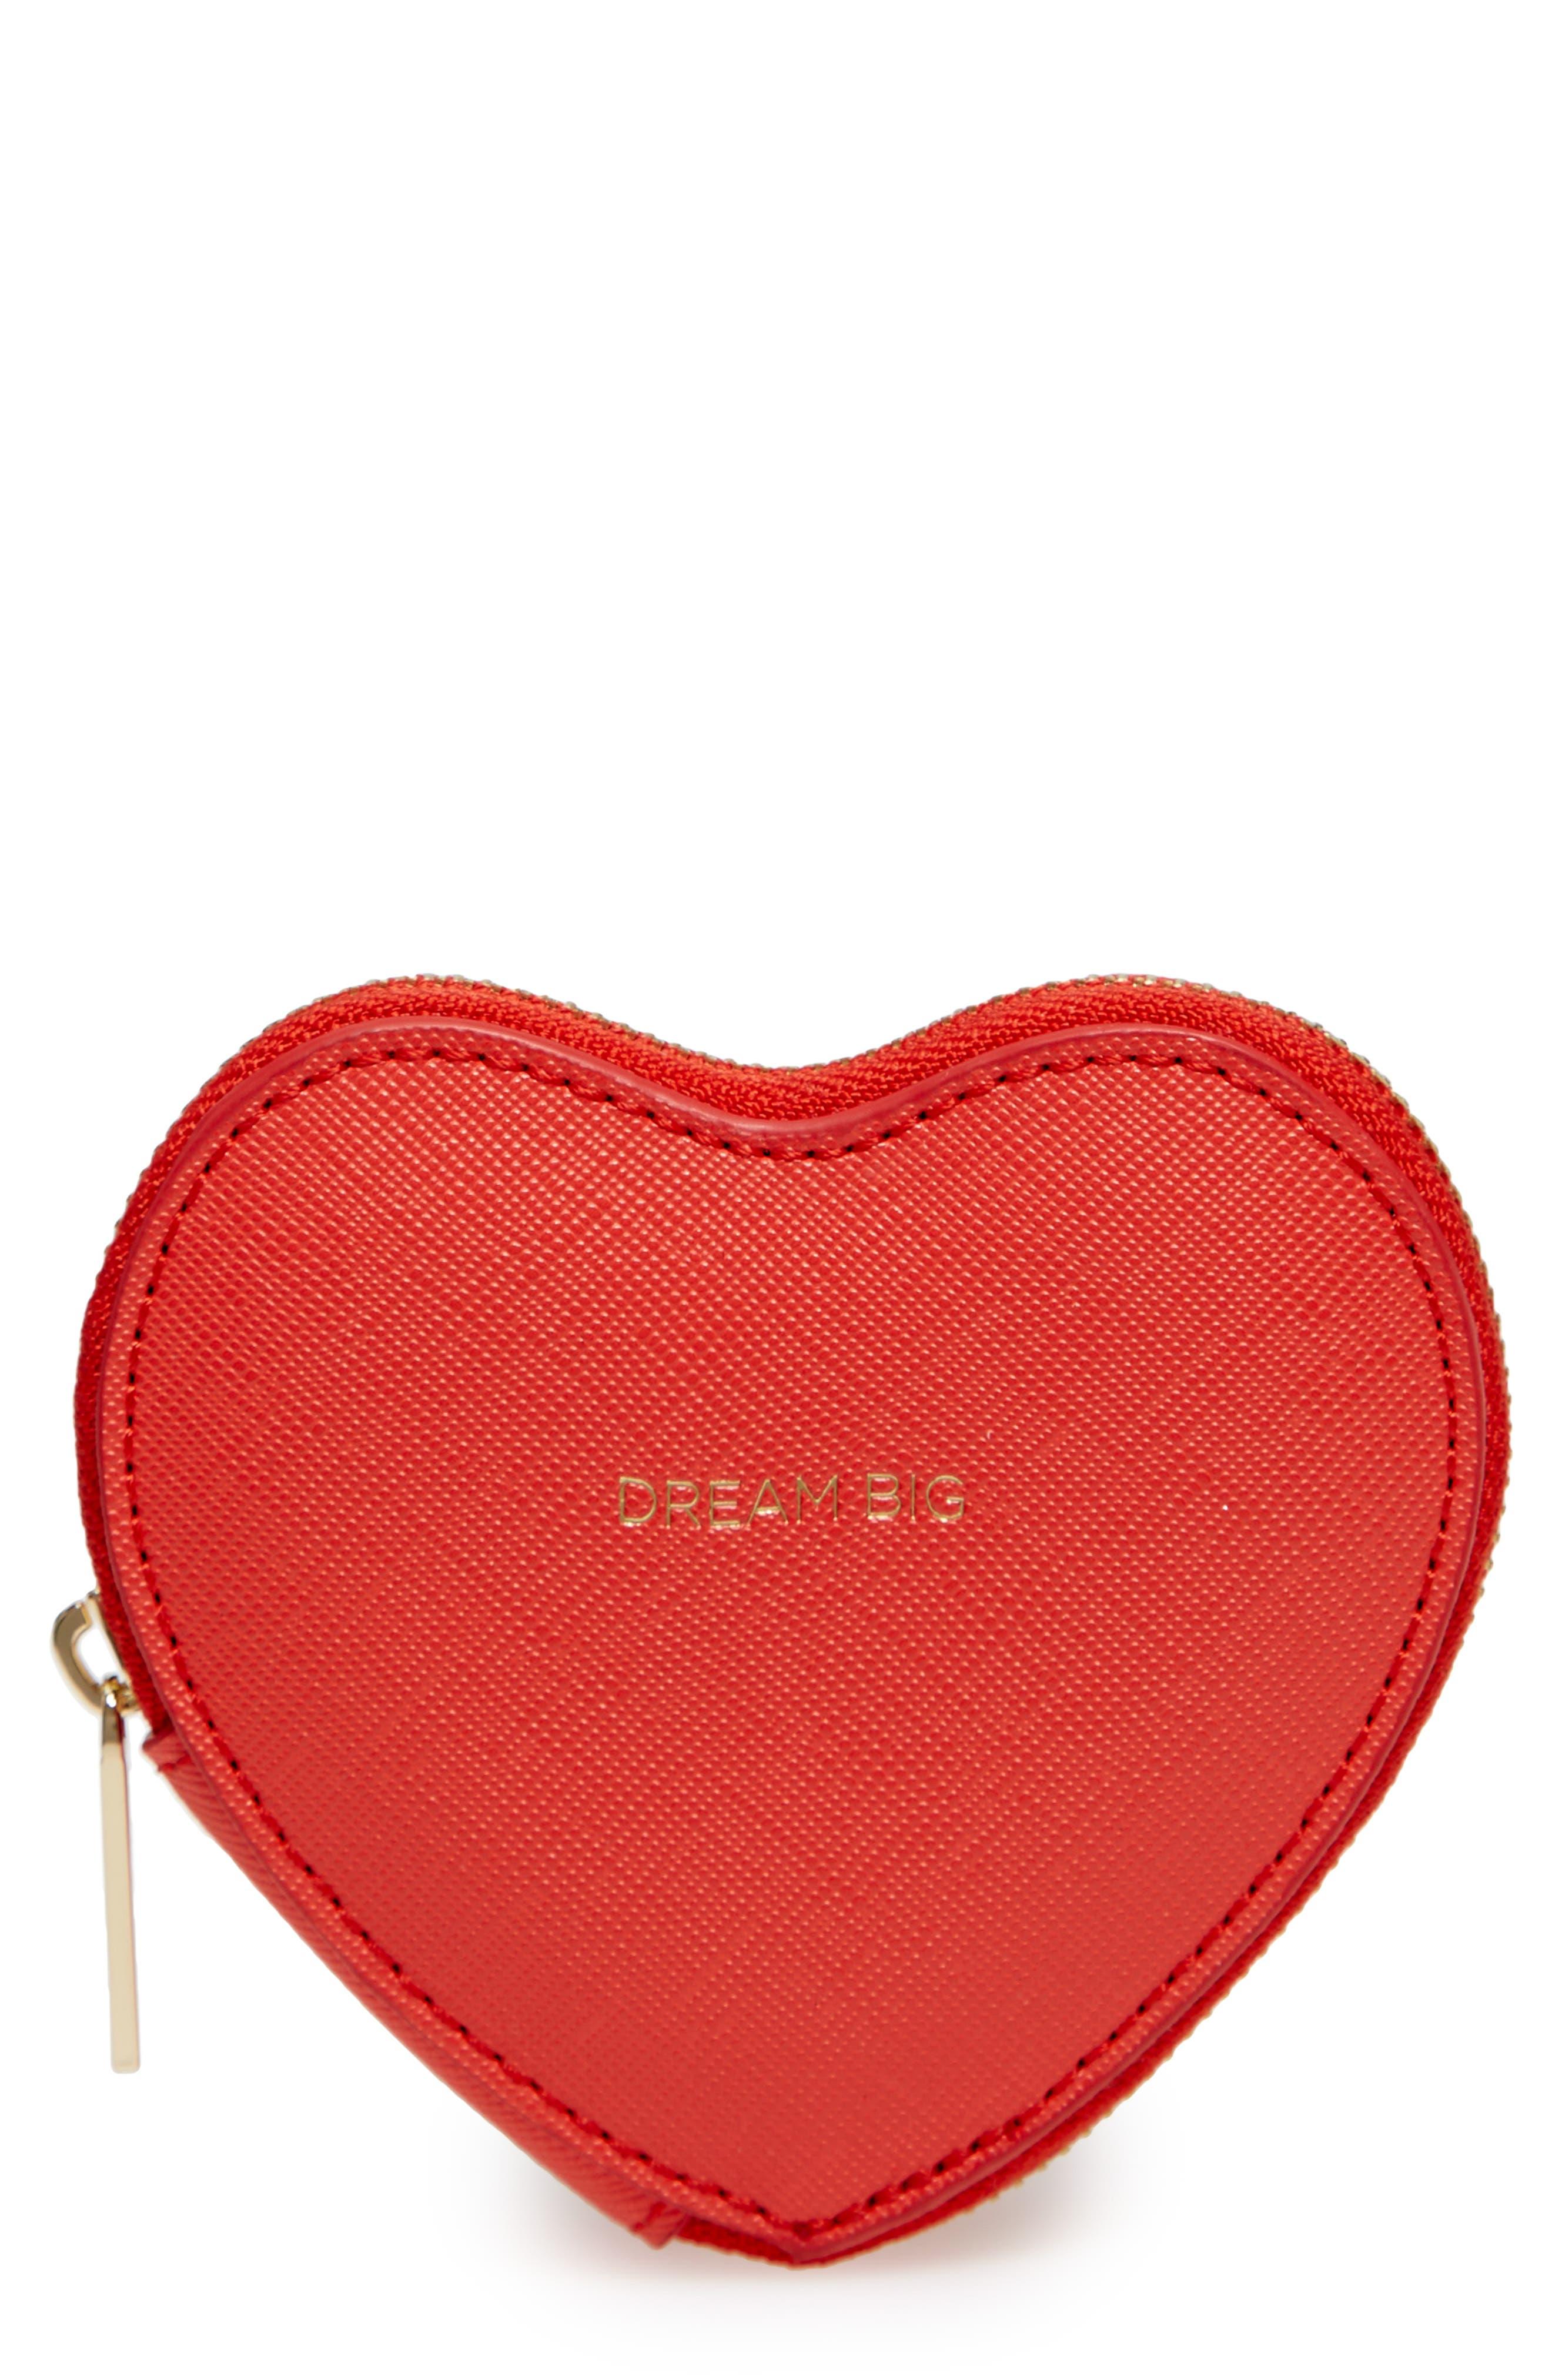 Dream Big Heart Faux Leather Coin Purse,                             Main thumbnail 1, color,                             601